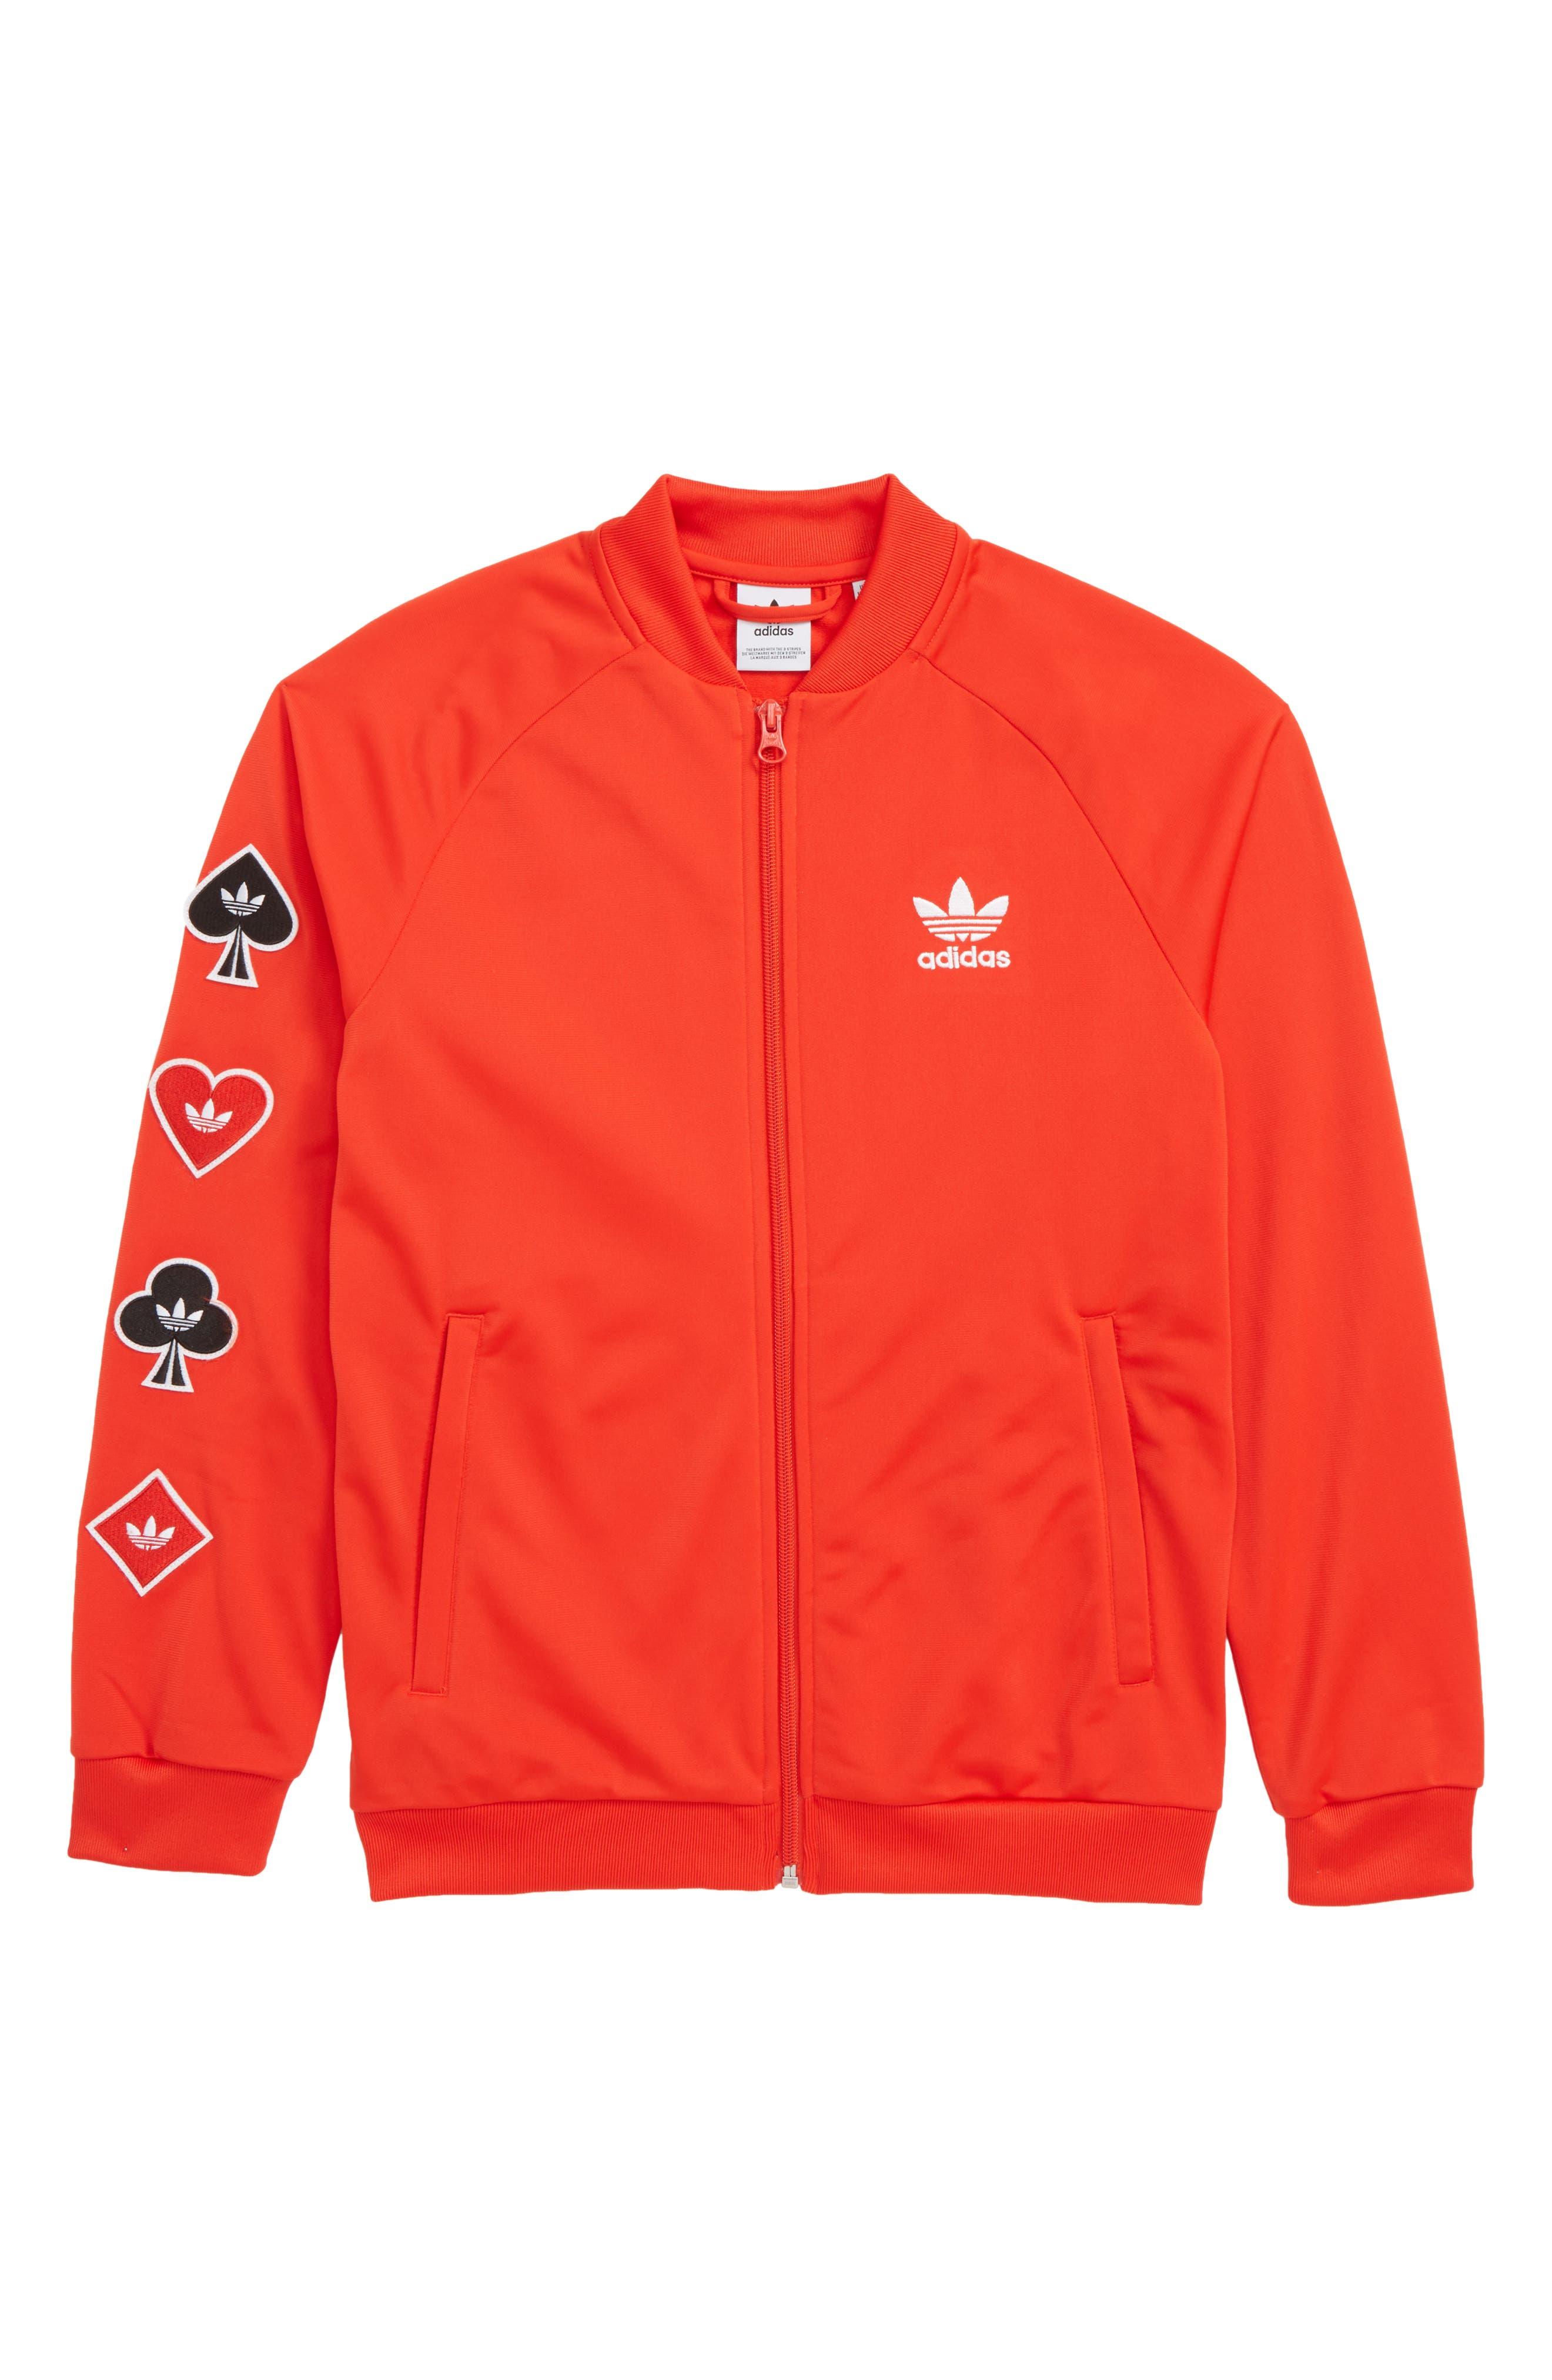 ADIDAS ORIGINALS, V-Day Superstar Jacket, Main thumbnail 1, color, ACTIVE RED